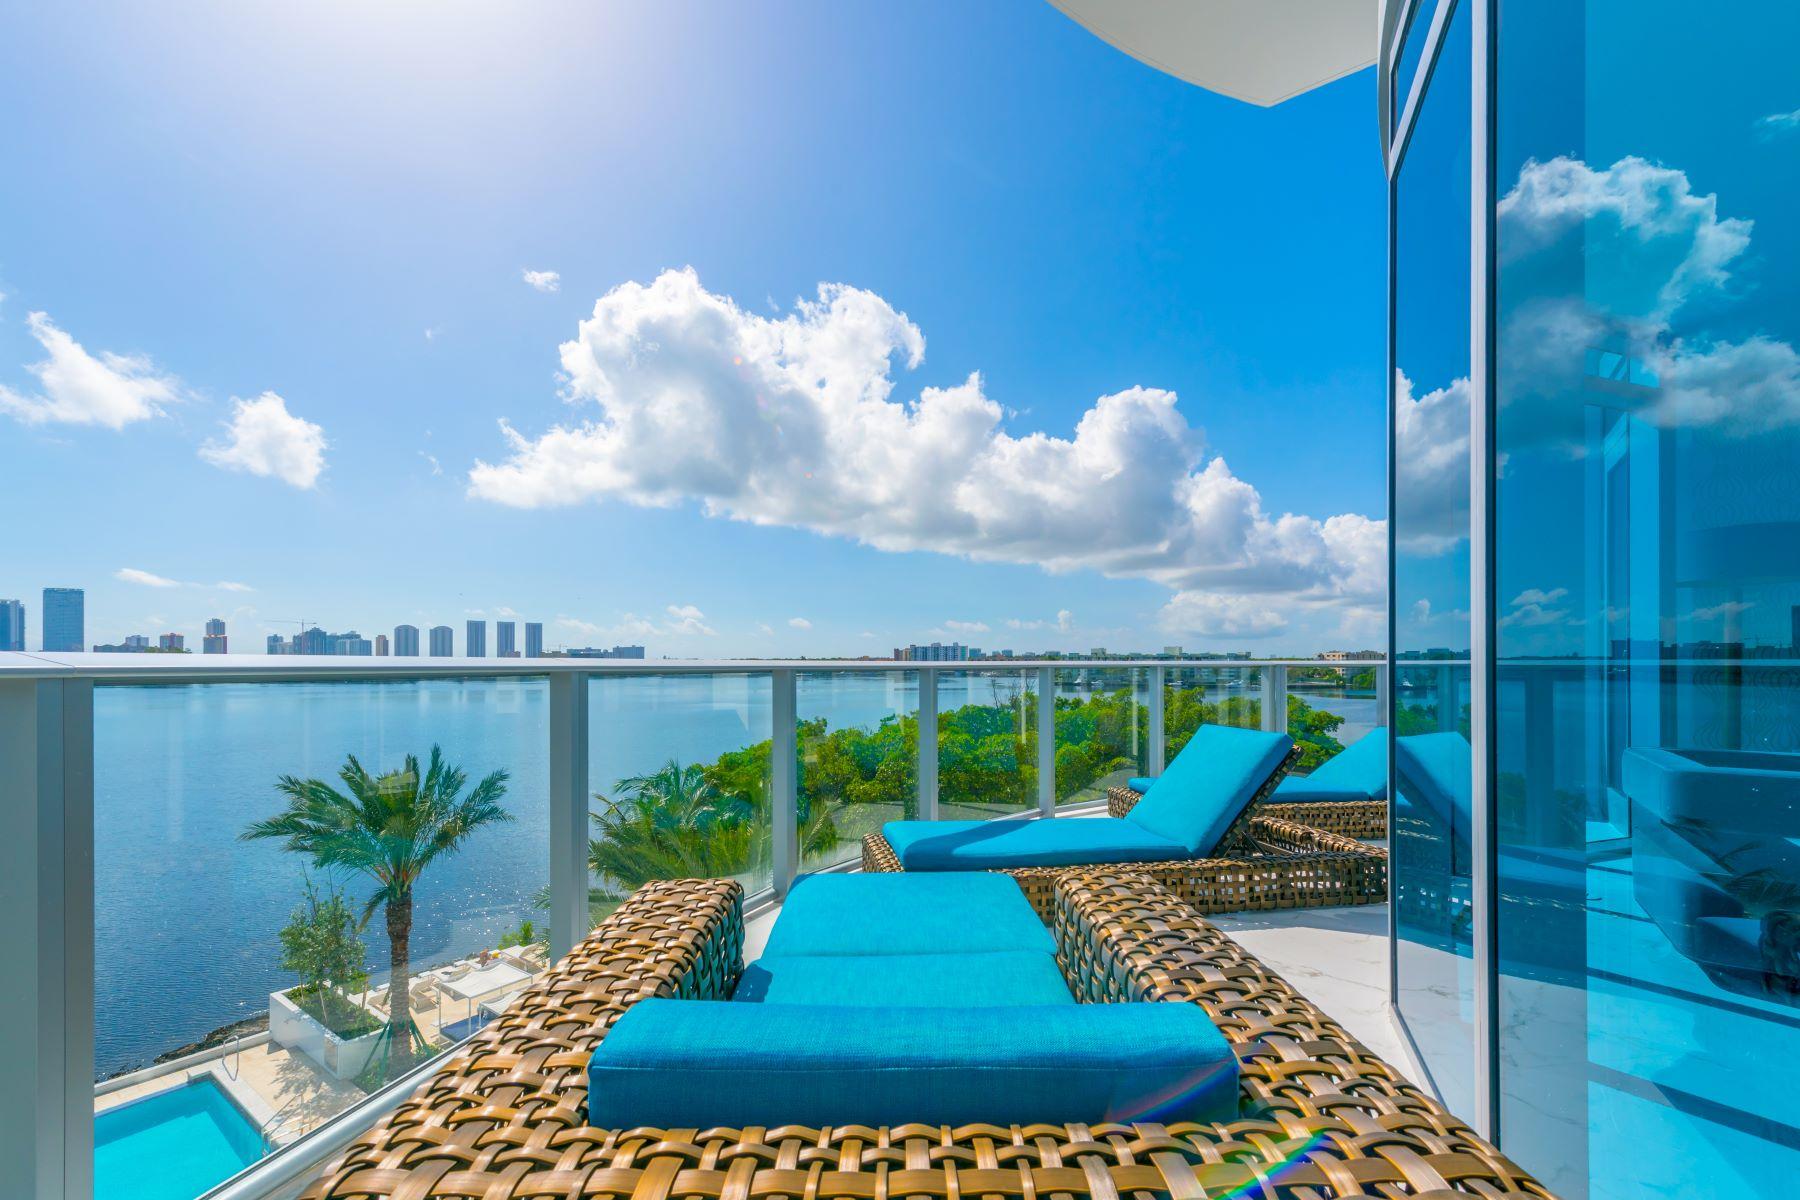 Condominiums for Sale at 17111 Biscayne Blvd #411 17111 Biscayne Blvd 411, North Miami, Florida 33160 United States